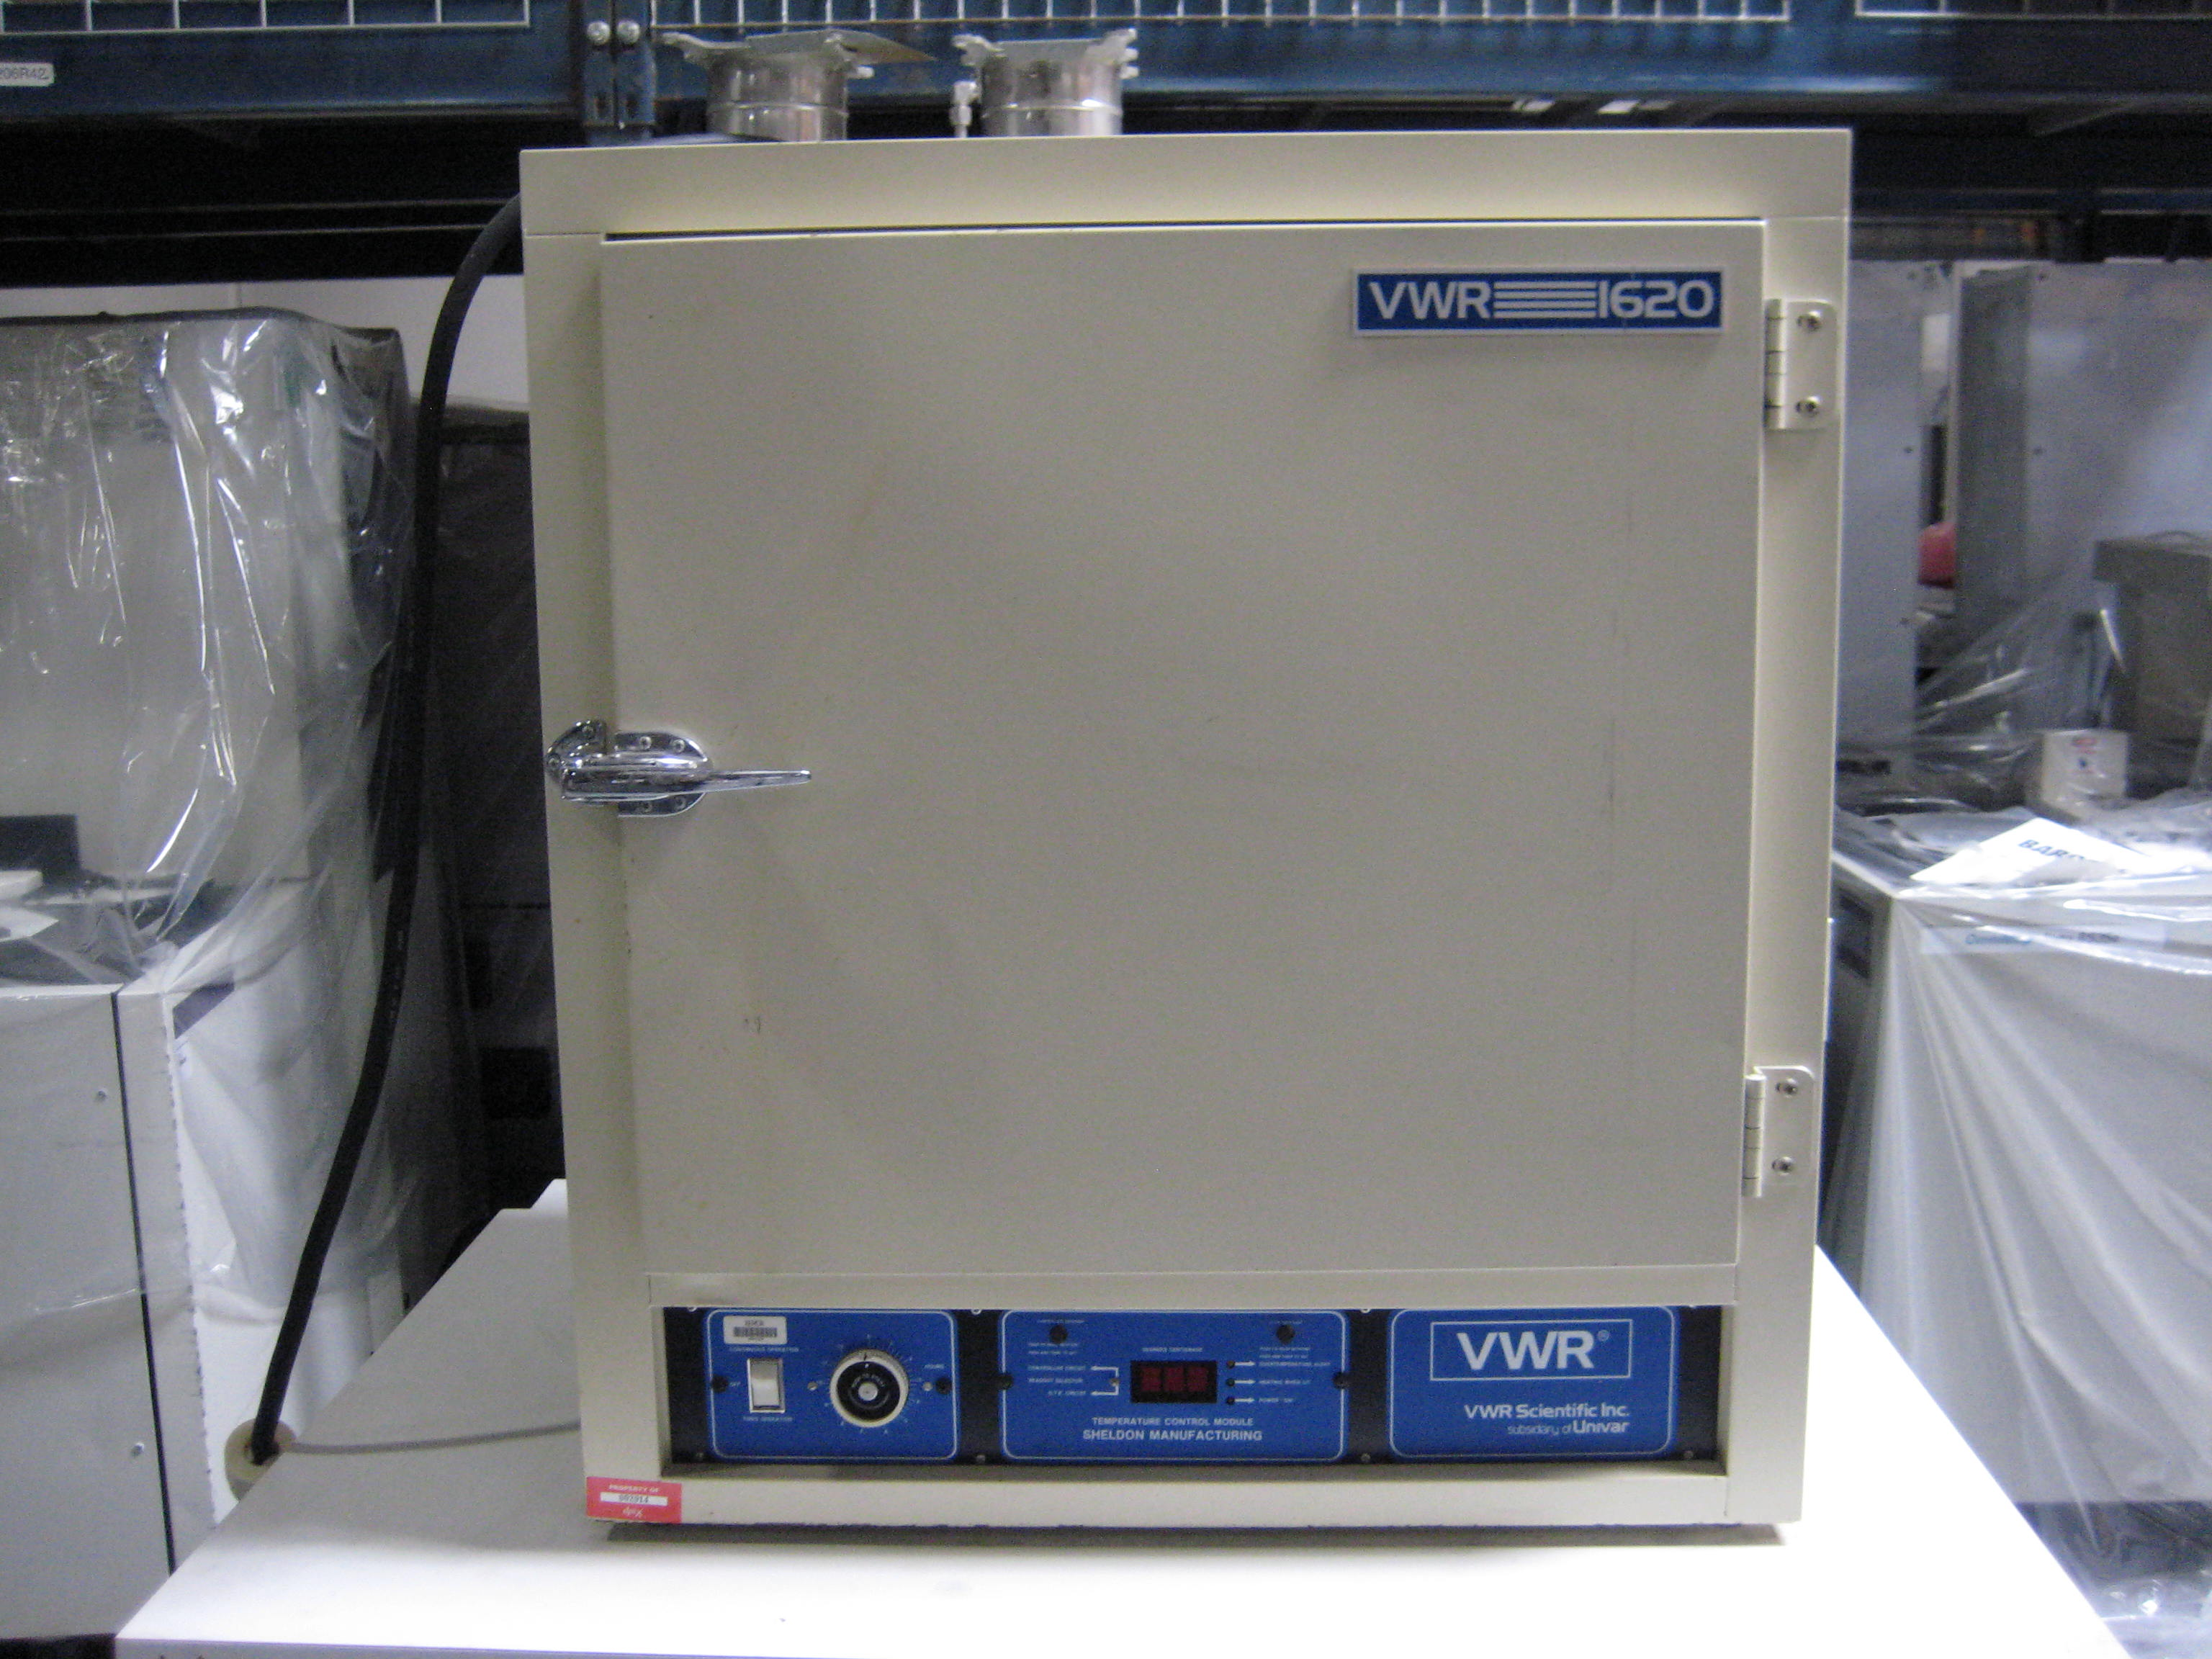 SPEC Equipment > Equipment Inventory > Buy Refurbished HMDS Ovens #30446B